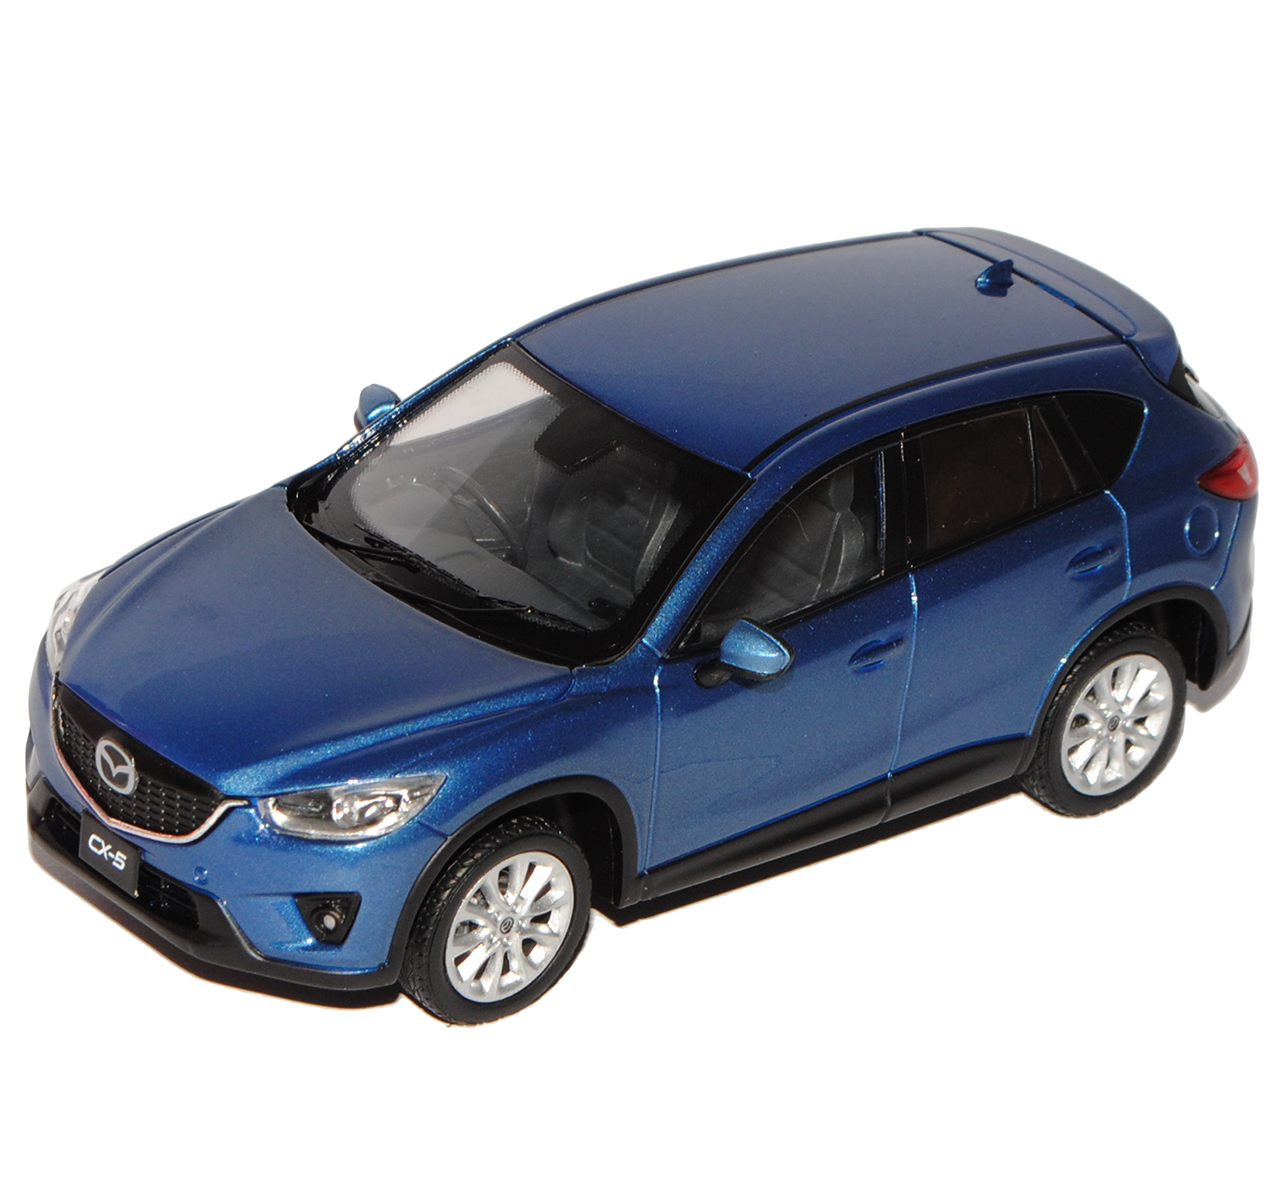 Mazda CX-5 Blau SUV Ab 2011 1//43 First 43 Modell Auto mit oder ohne individiue..